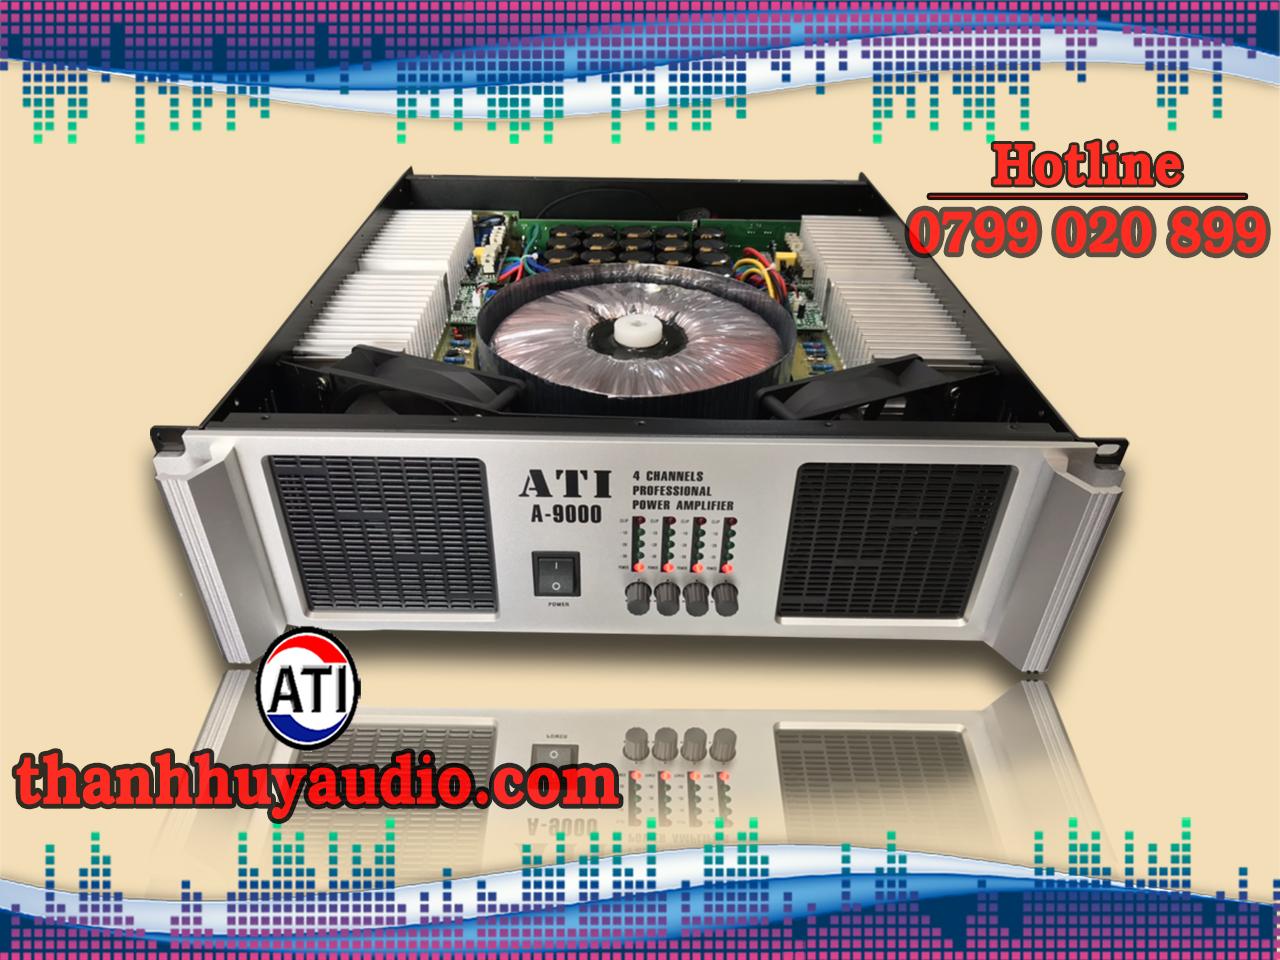 Cục đẩy ATI 9000